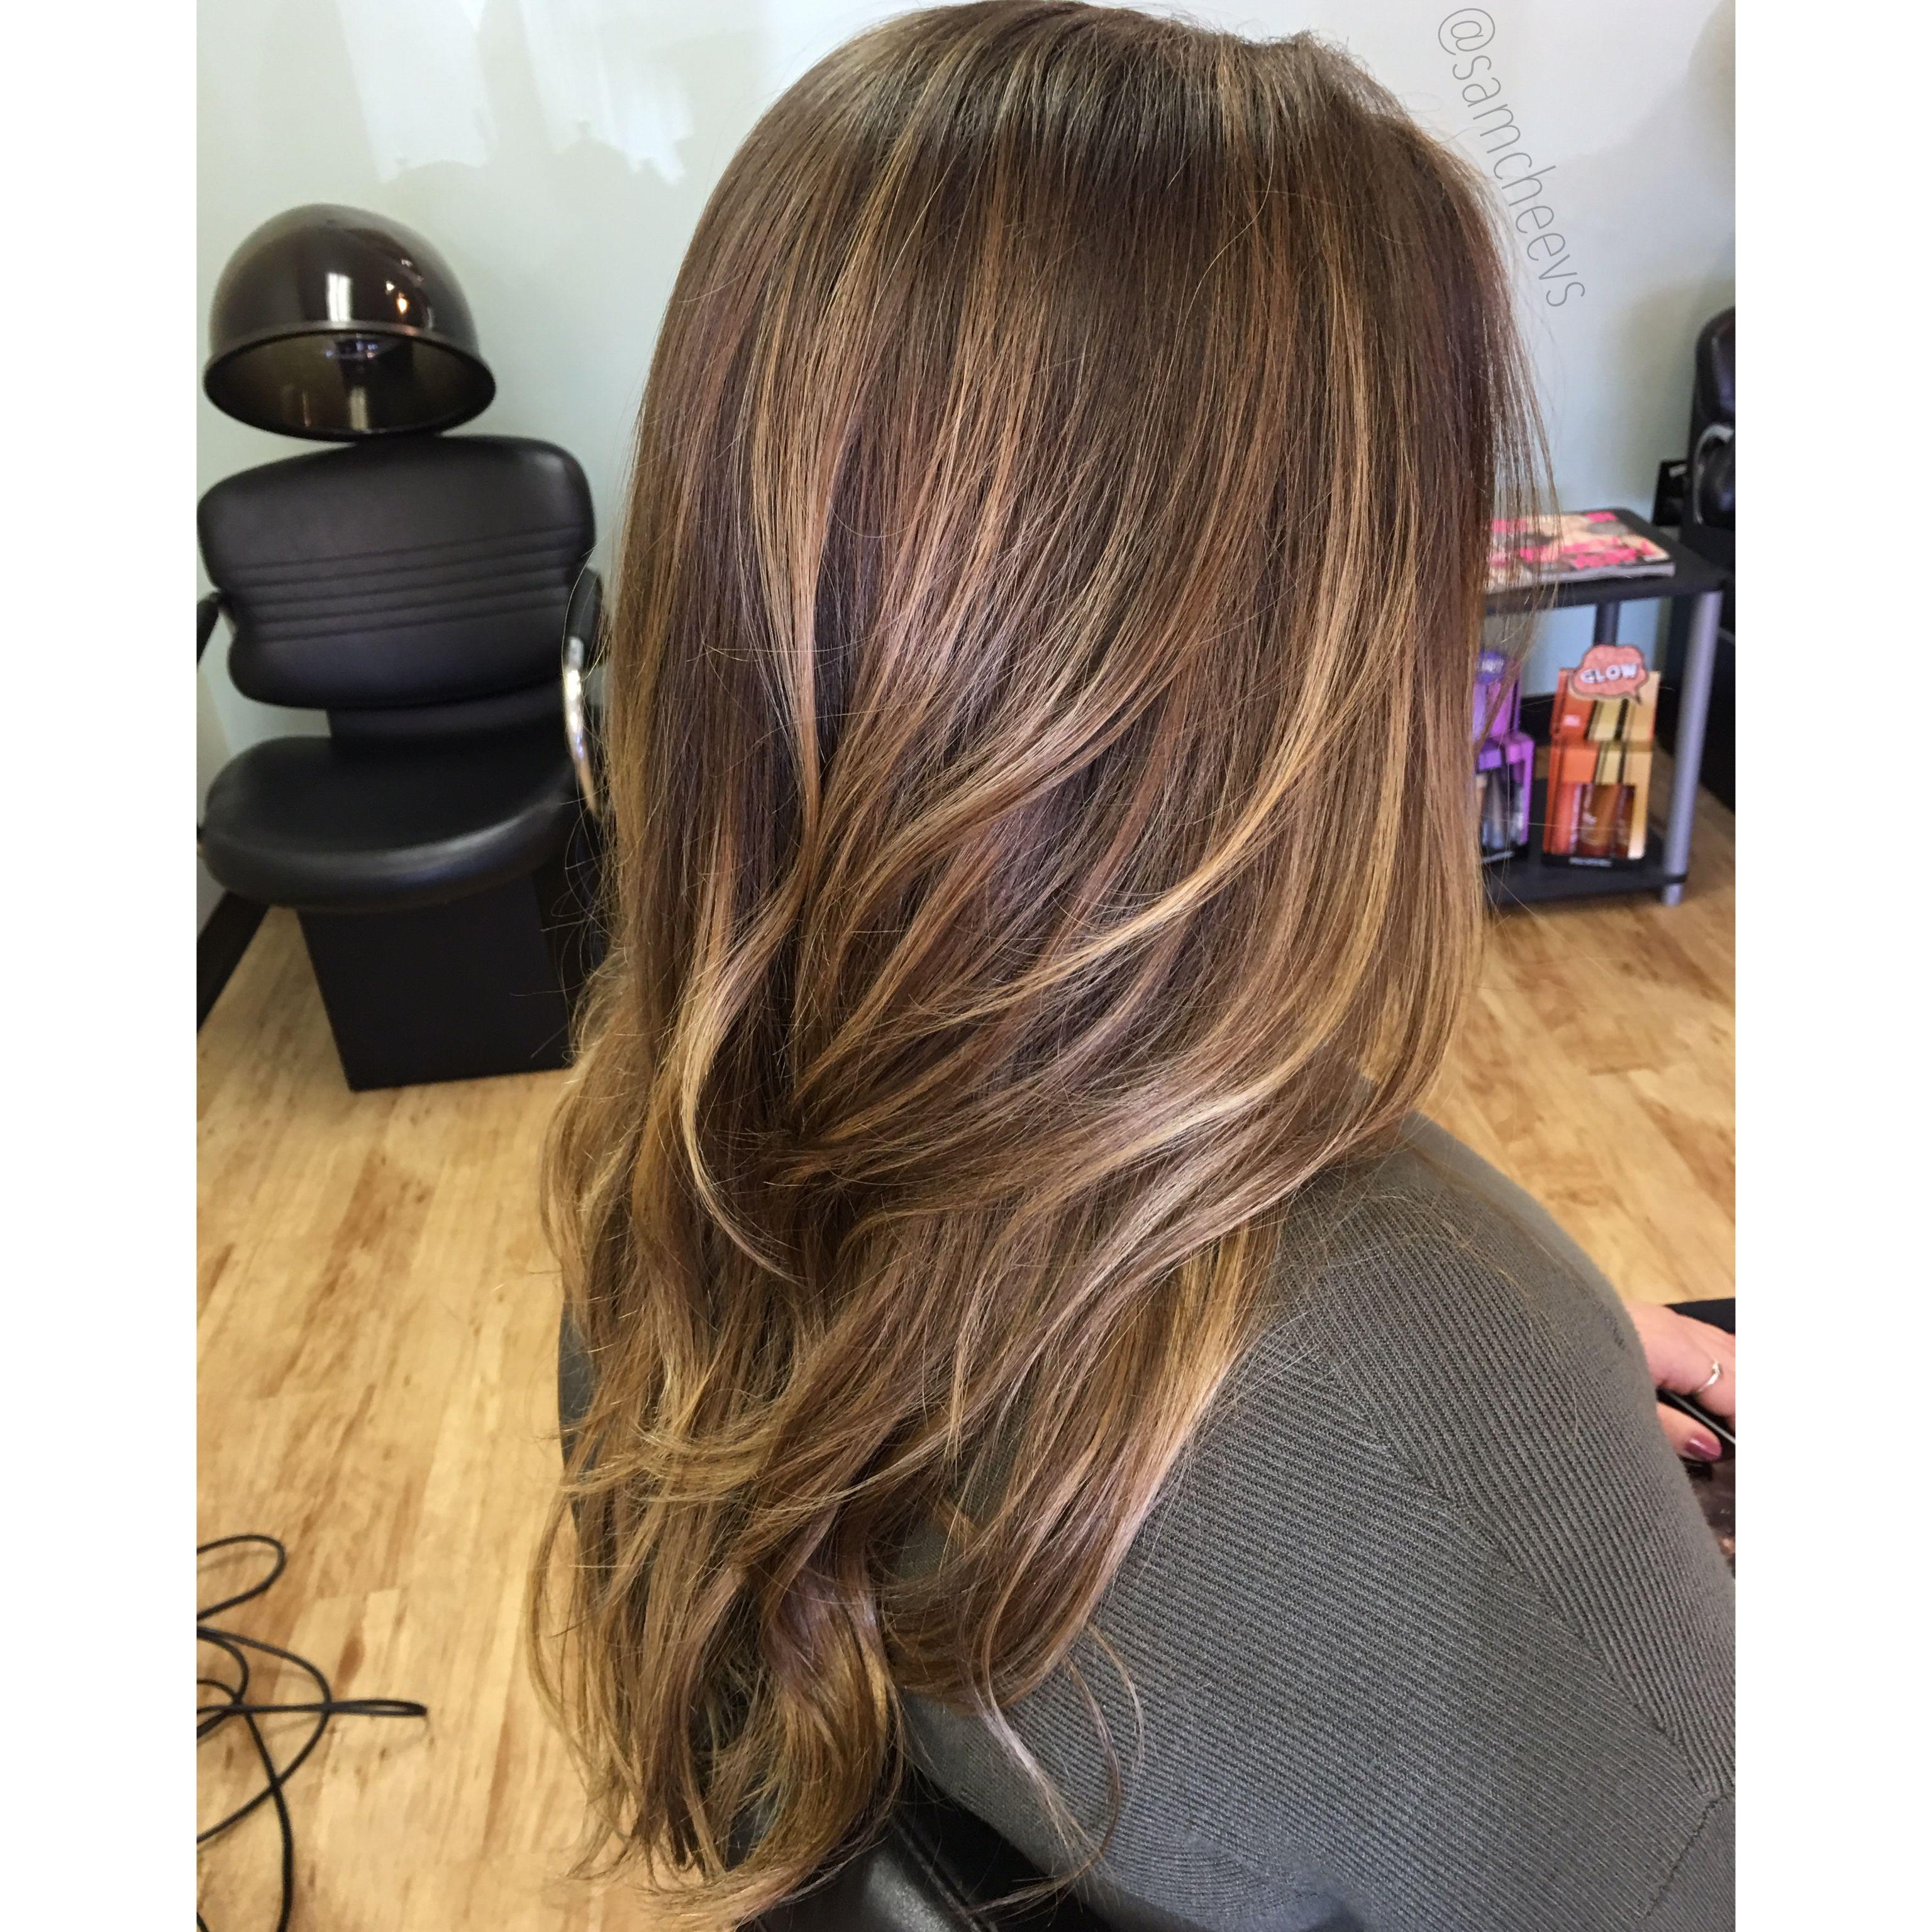 caramel highlights for dark hair balayage for brown hair types brunette hair styles hair. Black Bedroom Furniture Sets. Home Design Ideas